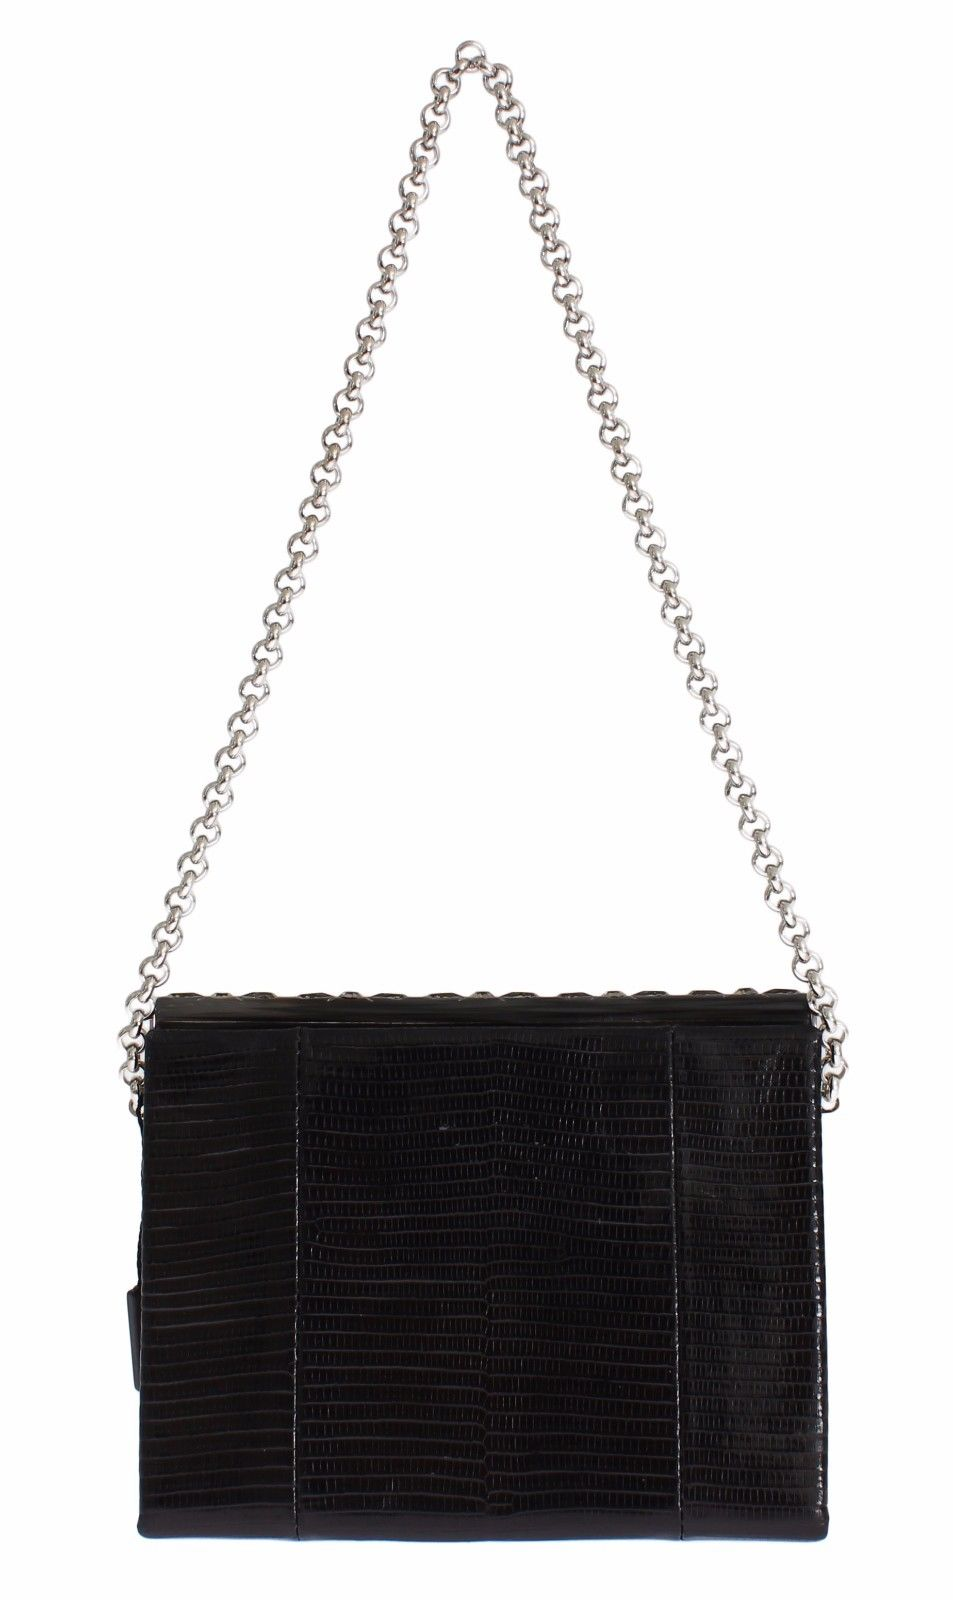 9ab55967bc Bag Black Varano Lizard Shoulder Evening Party Clutch. Dolce   Gabbana